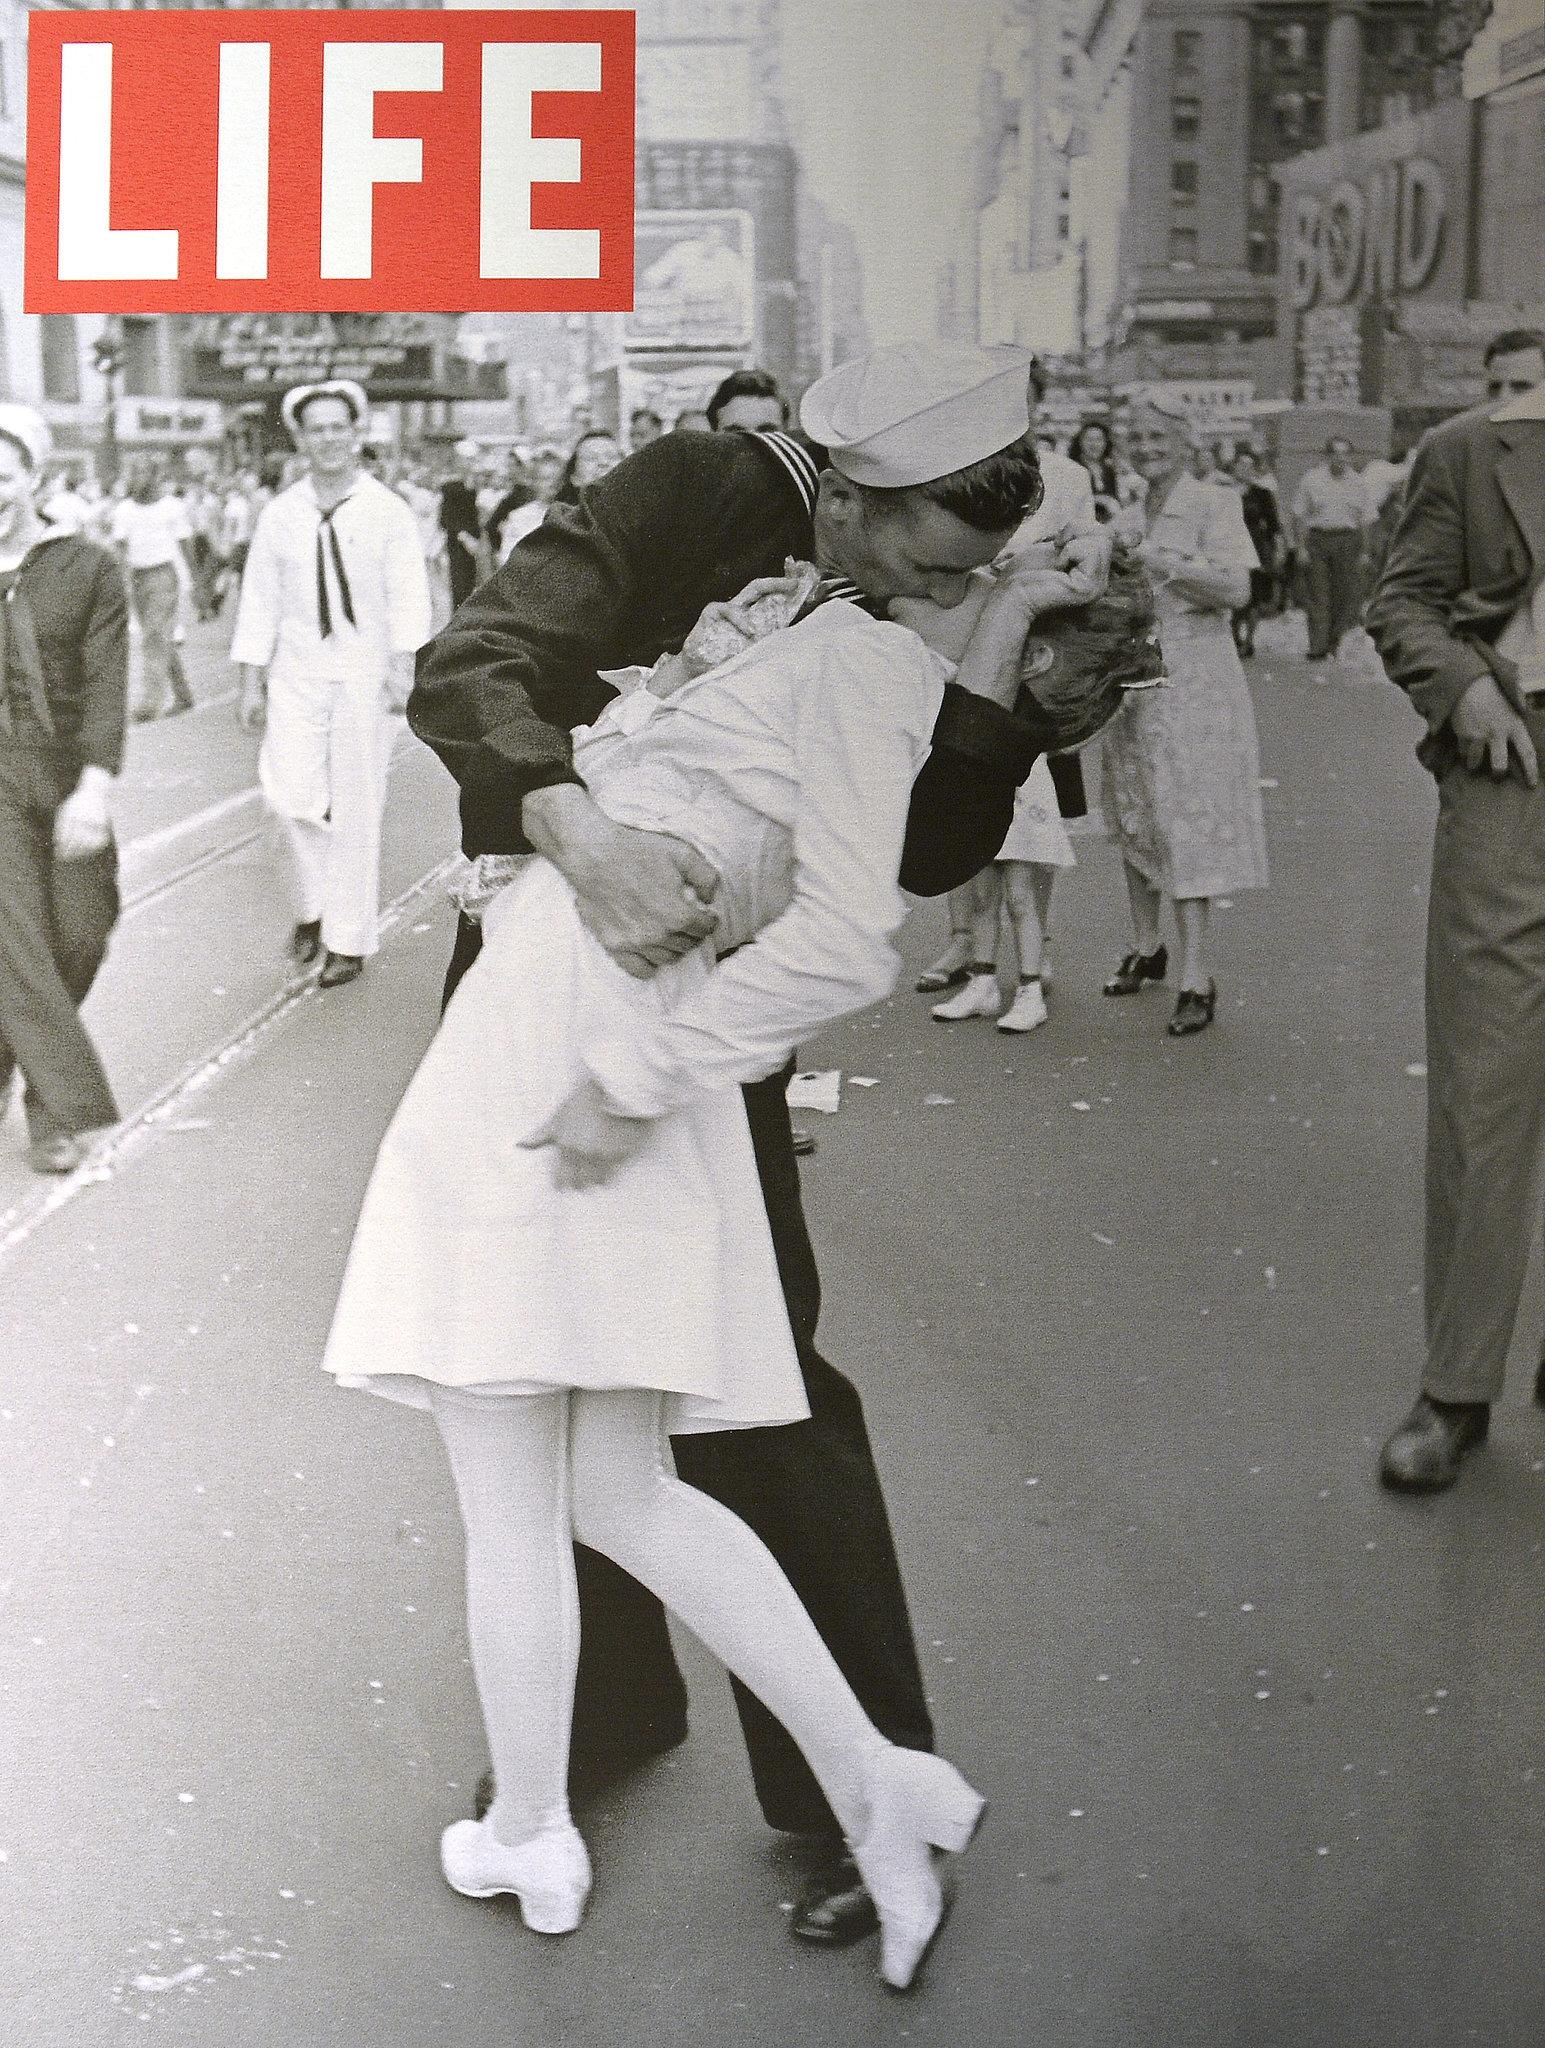 LIFE magazine cover (Copyright-Alfred Eisenstaedt/Life Magazine)